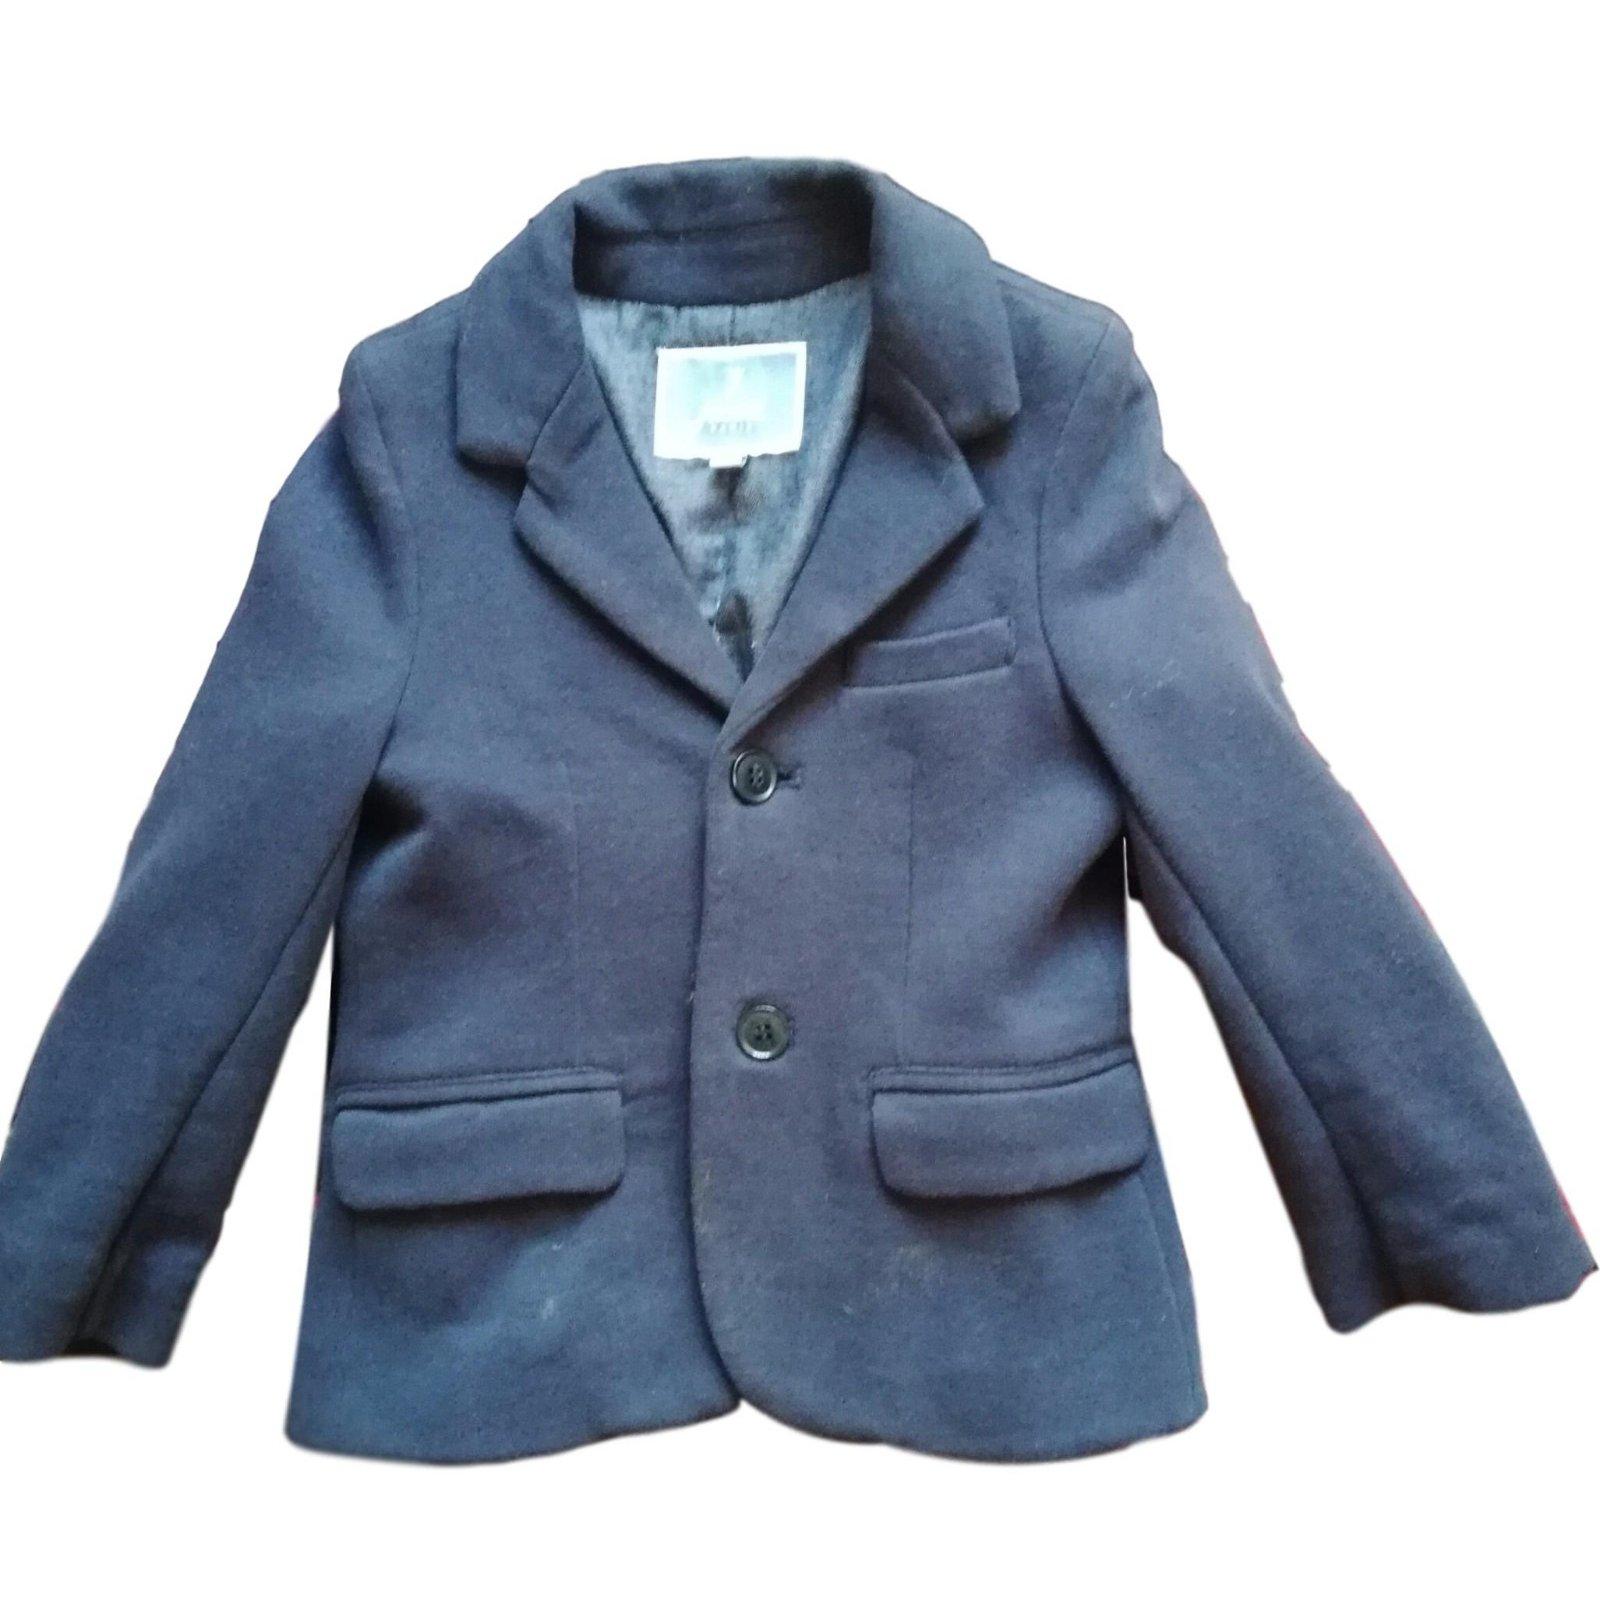 Veste coton bleu marine